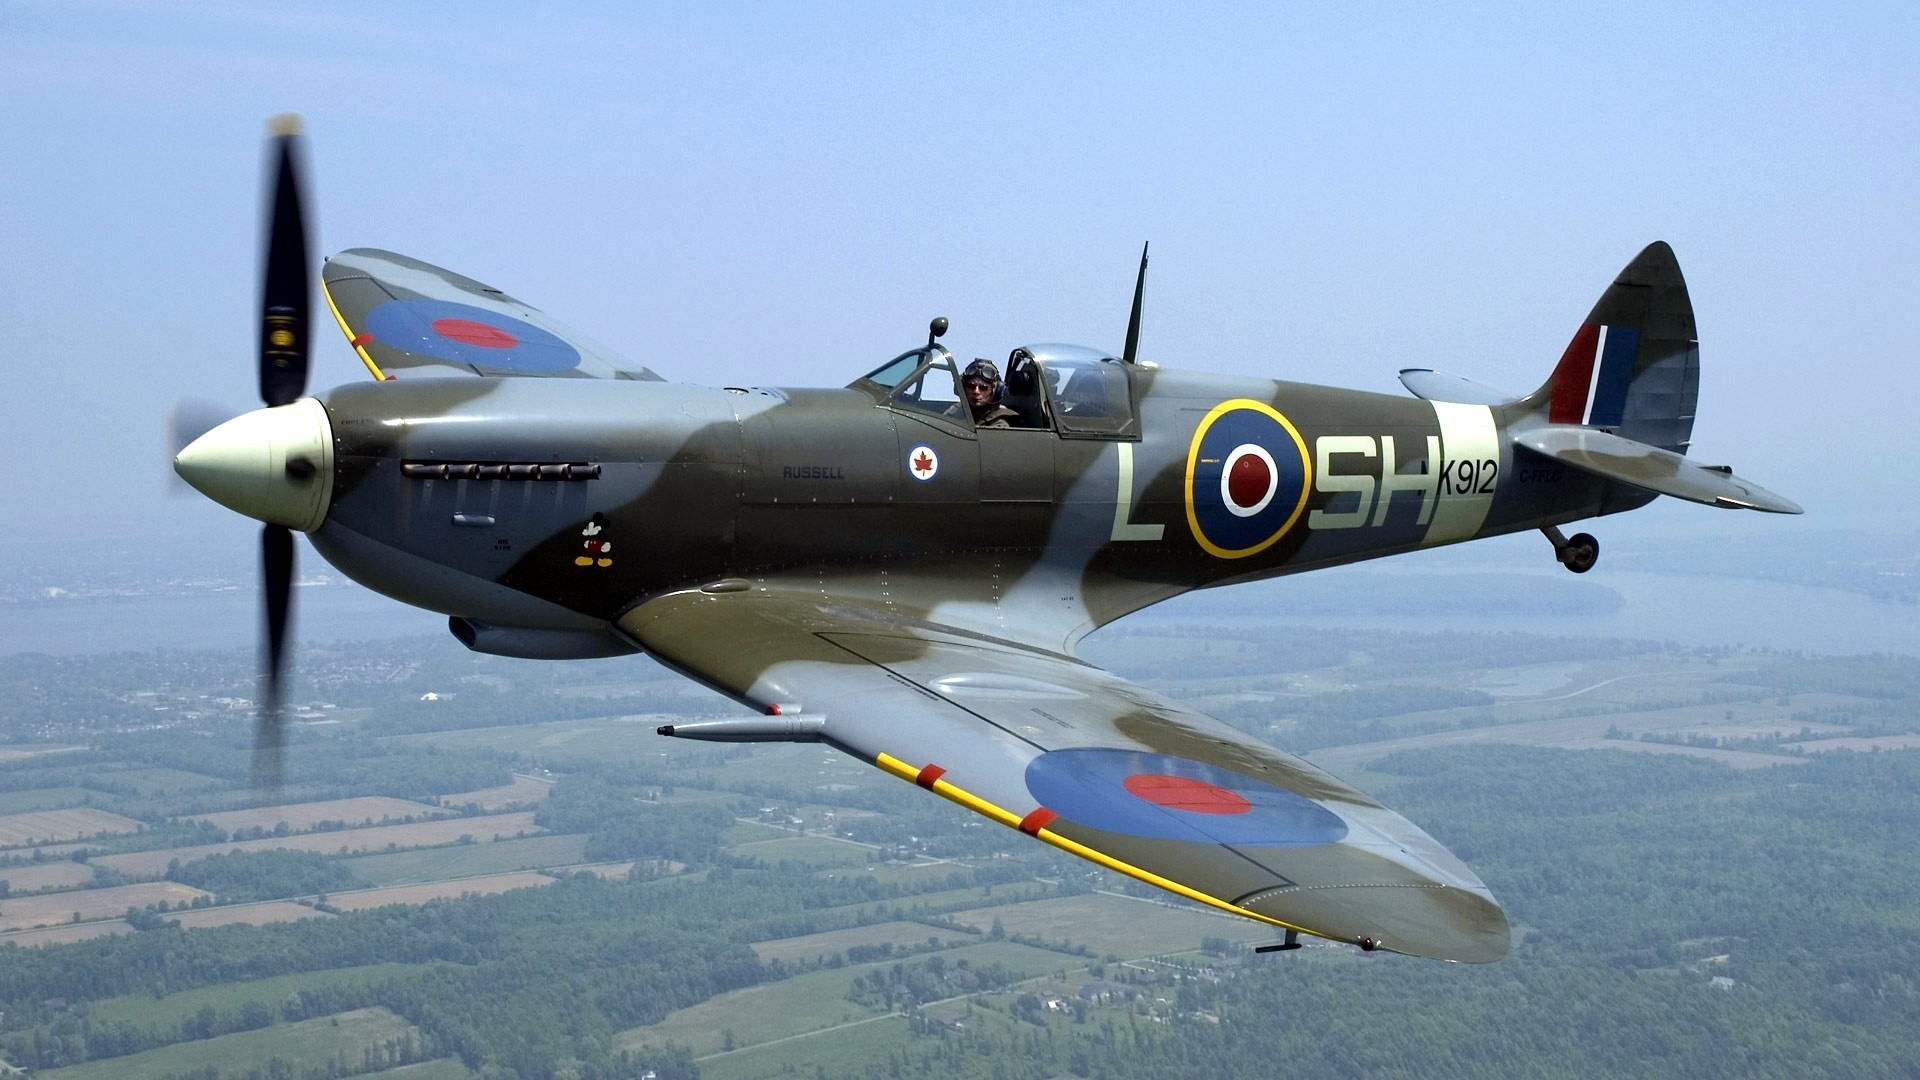 Res: 1920x1080, Spitfire